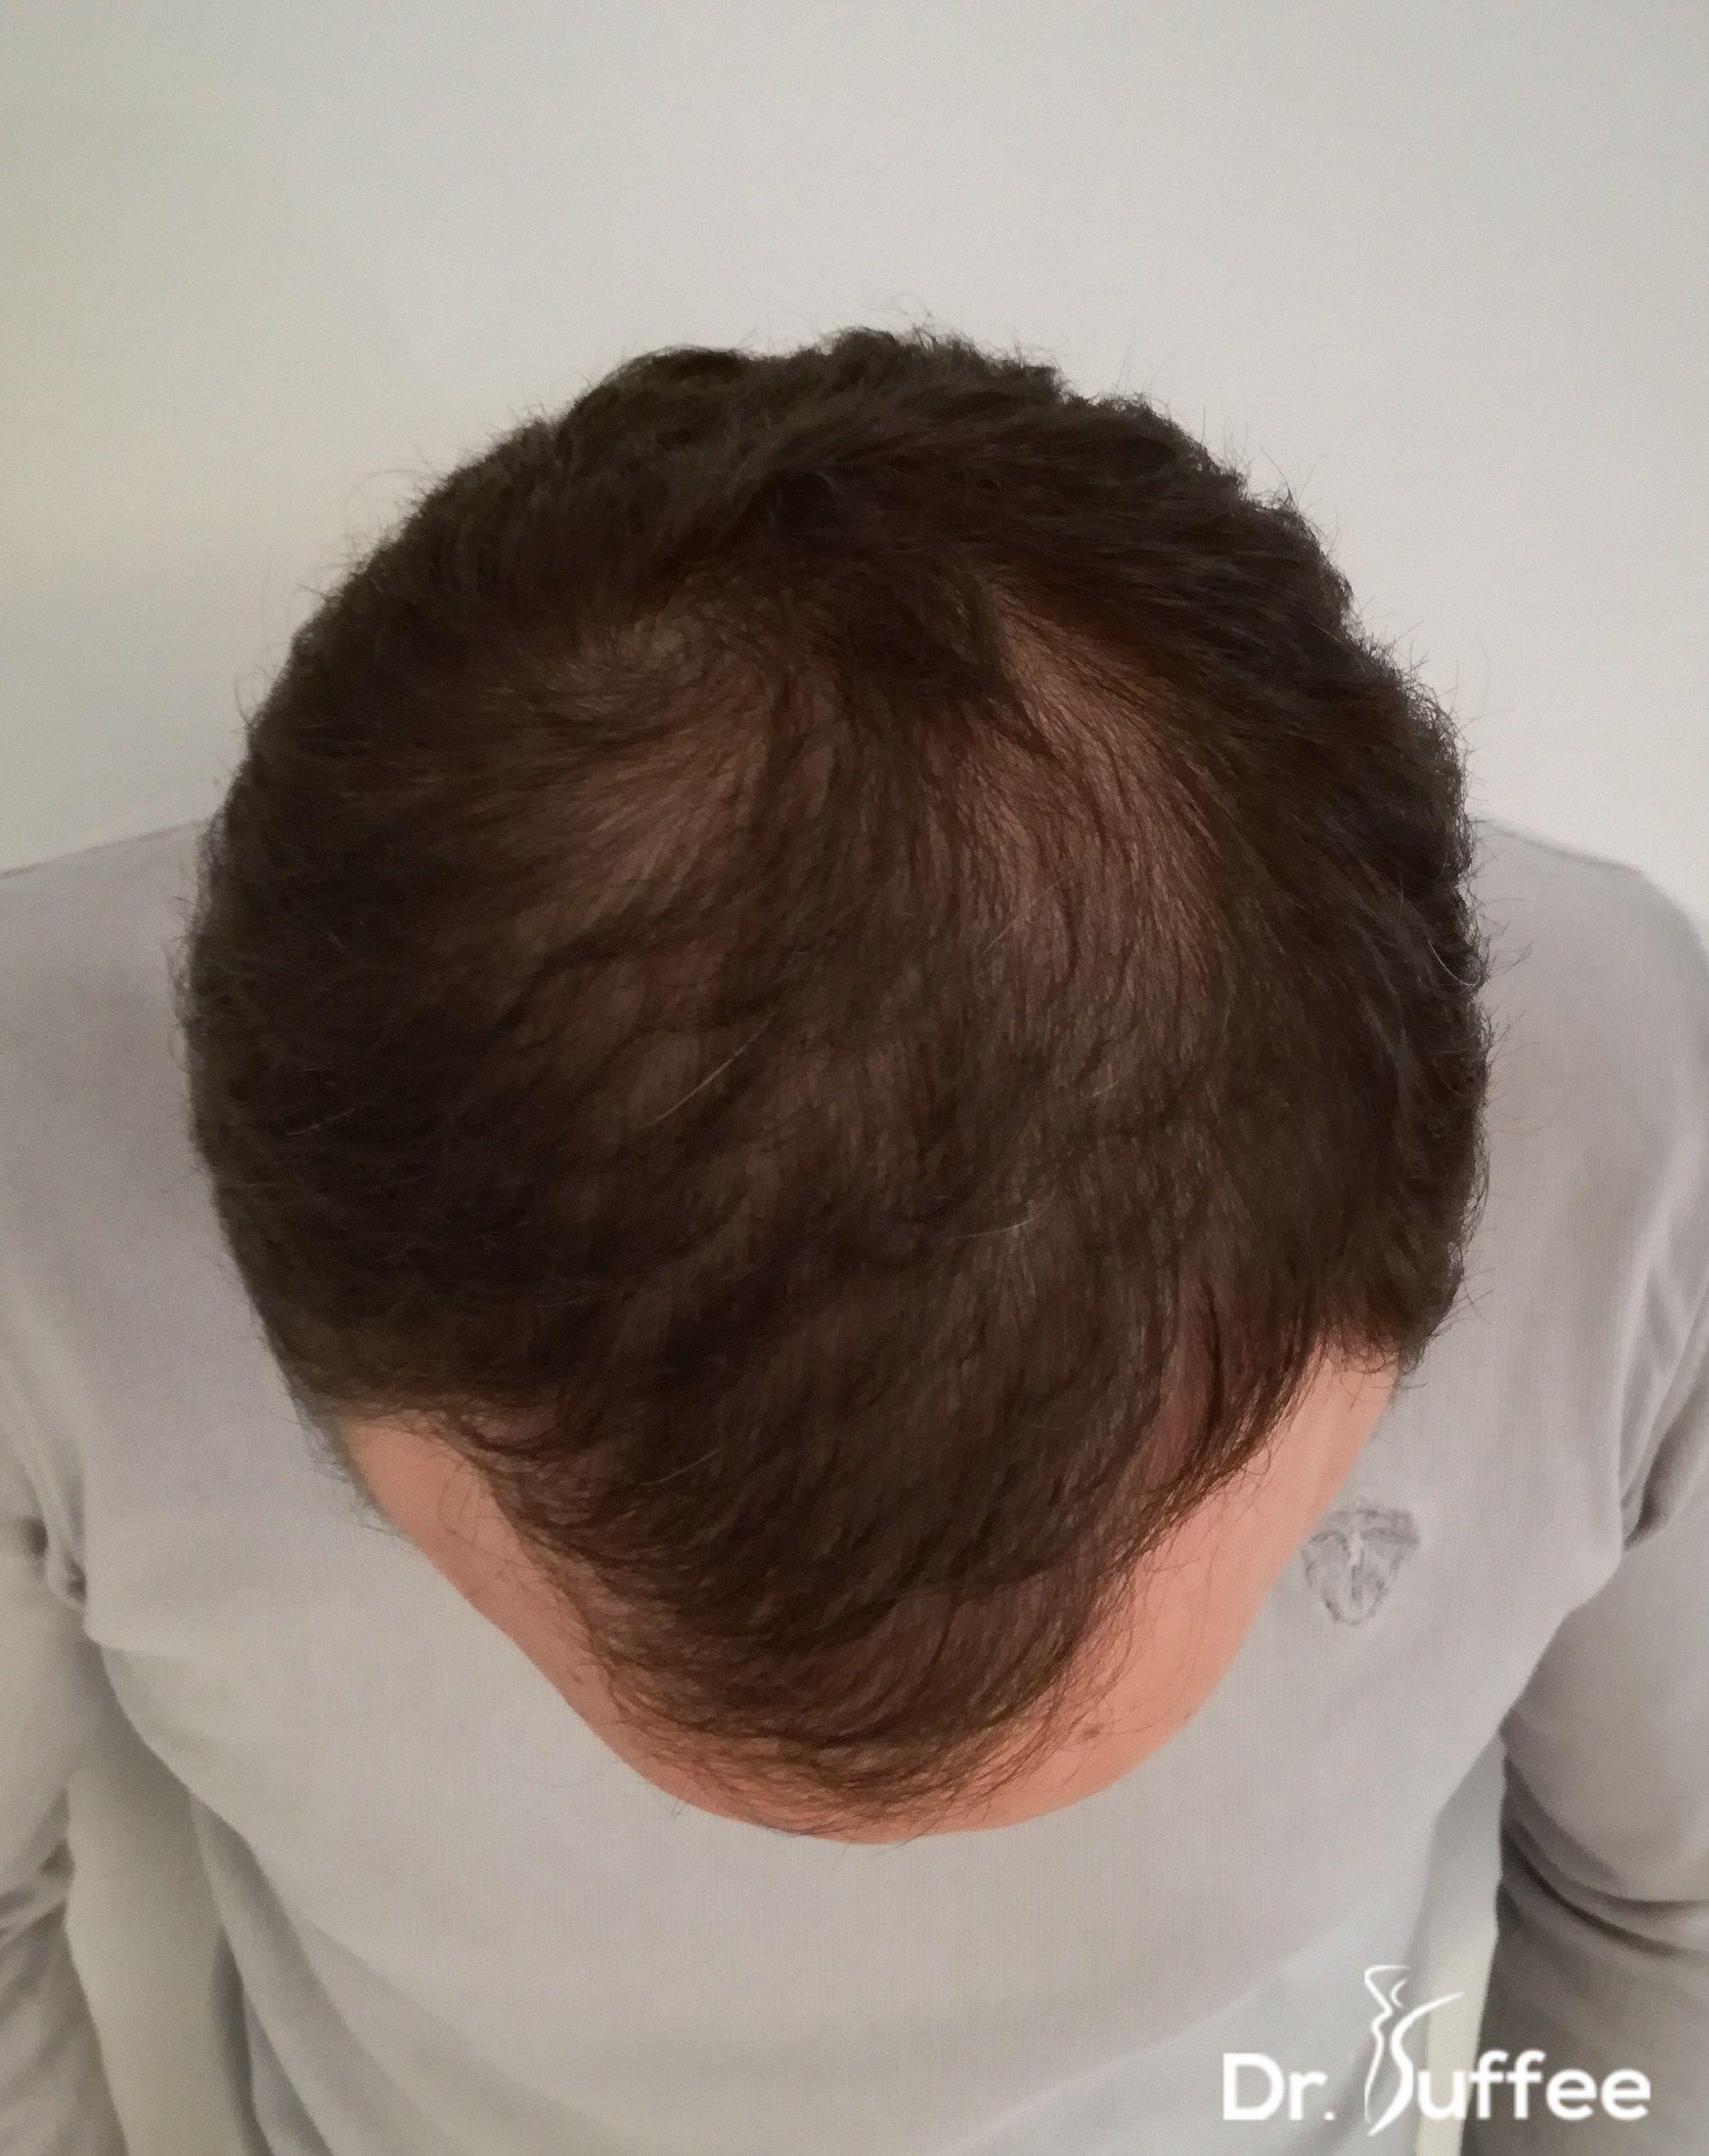 calvitie alopécie homme